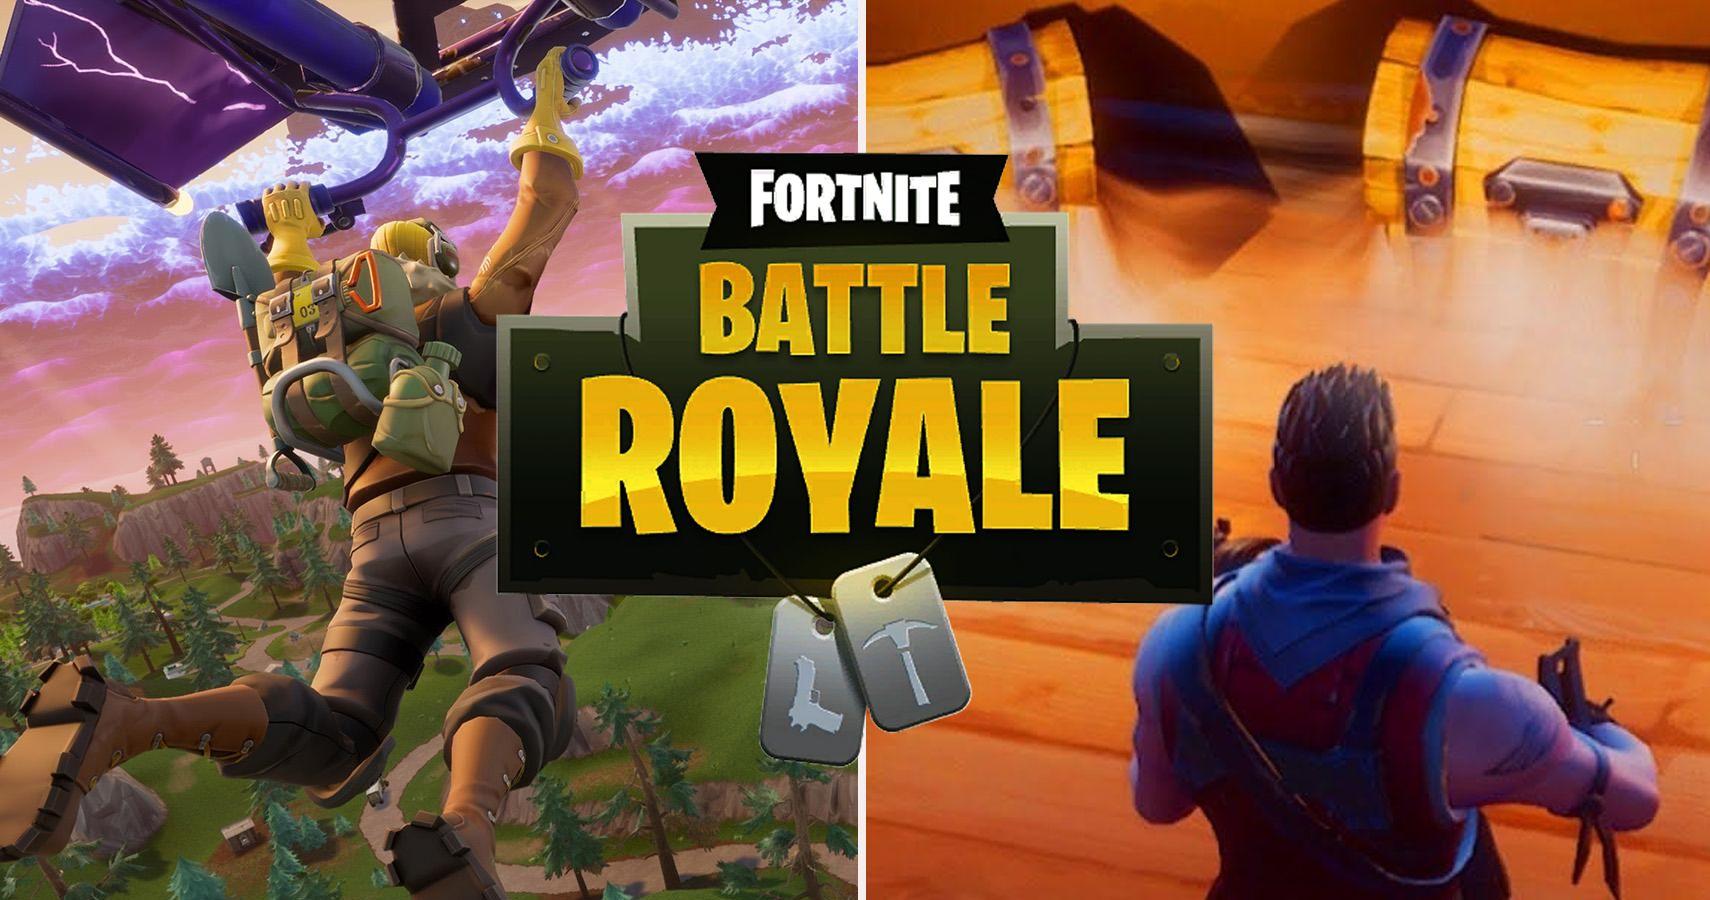 Battle funny royale ✔️ fortnite dating 2021 moment best I Hosted